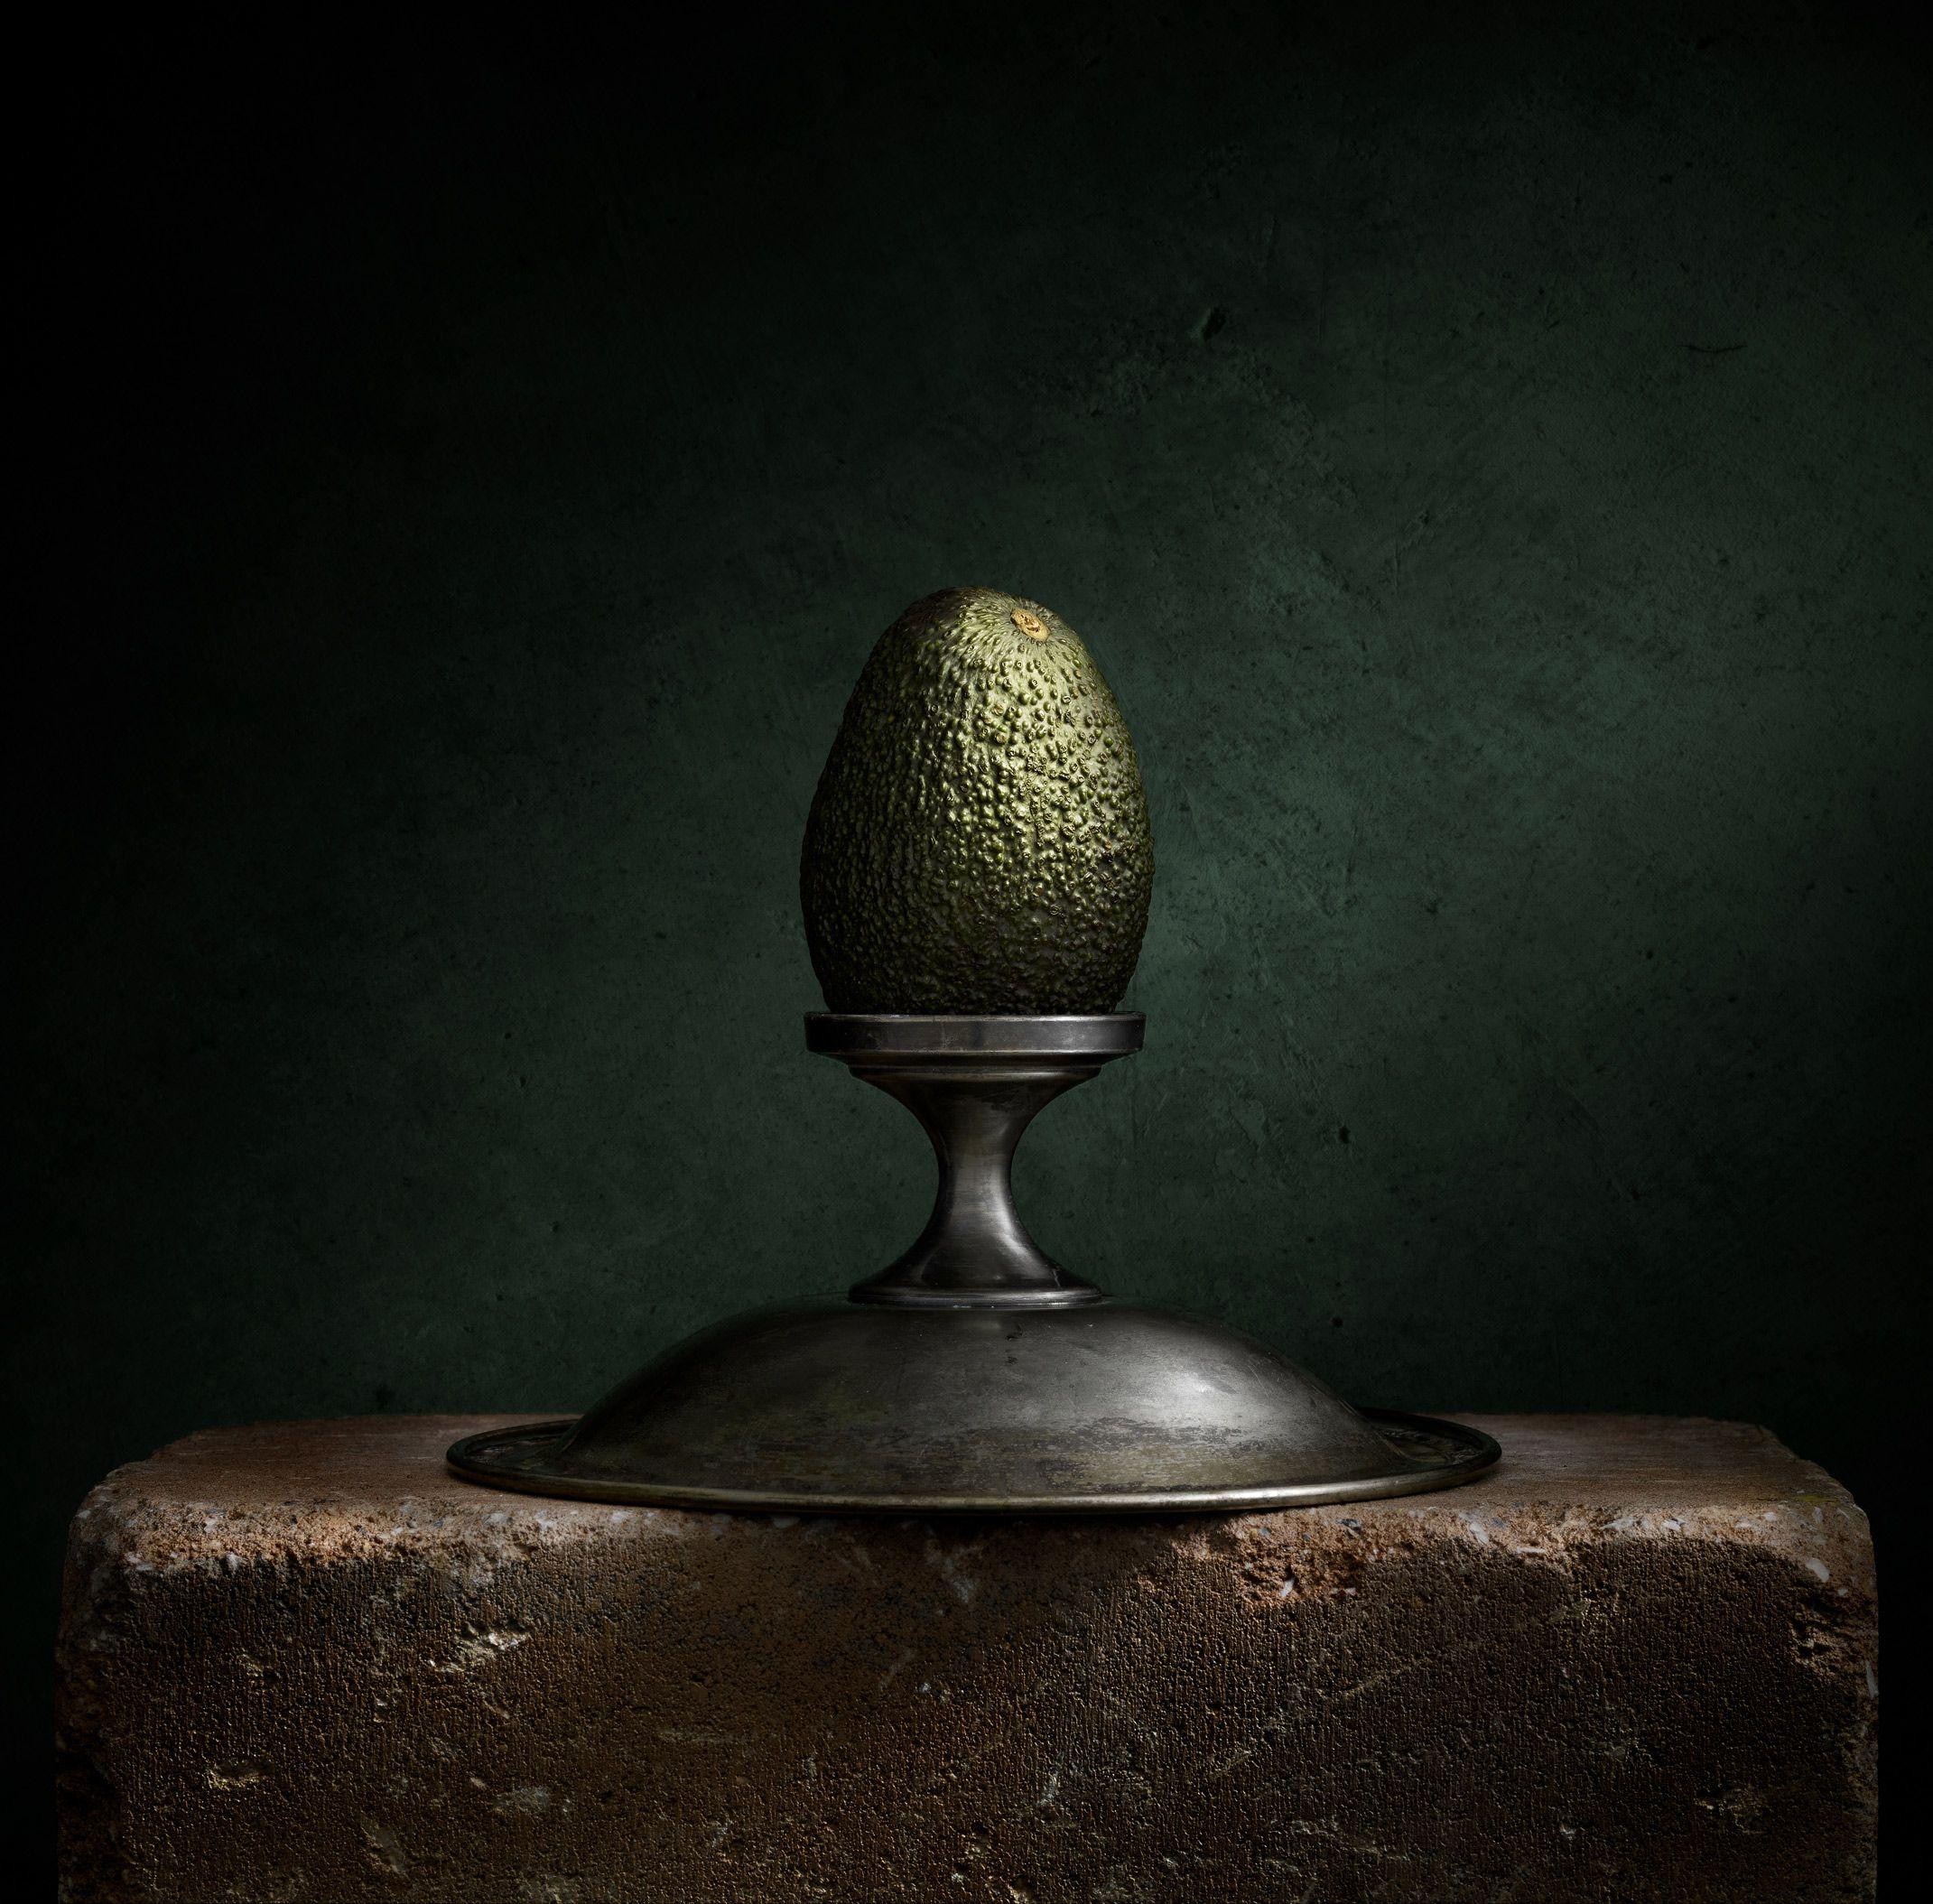 Still Life with Avocado by Harold Ross